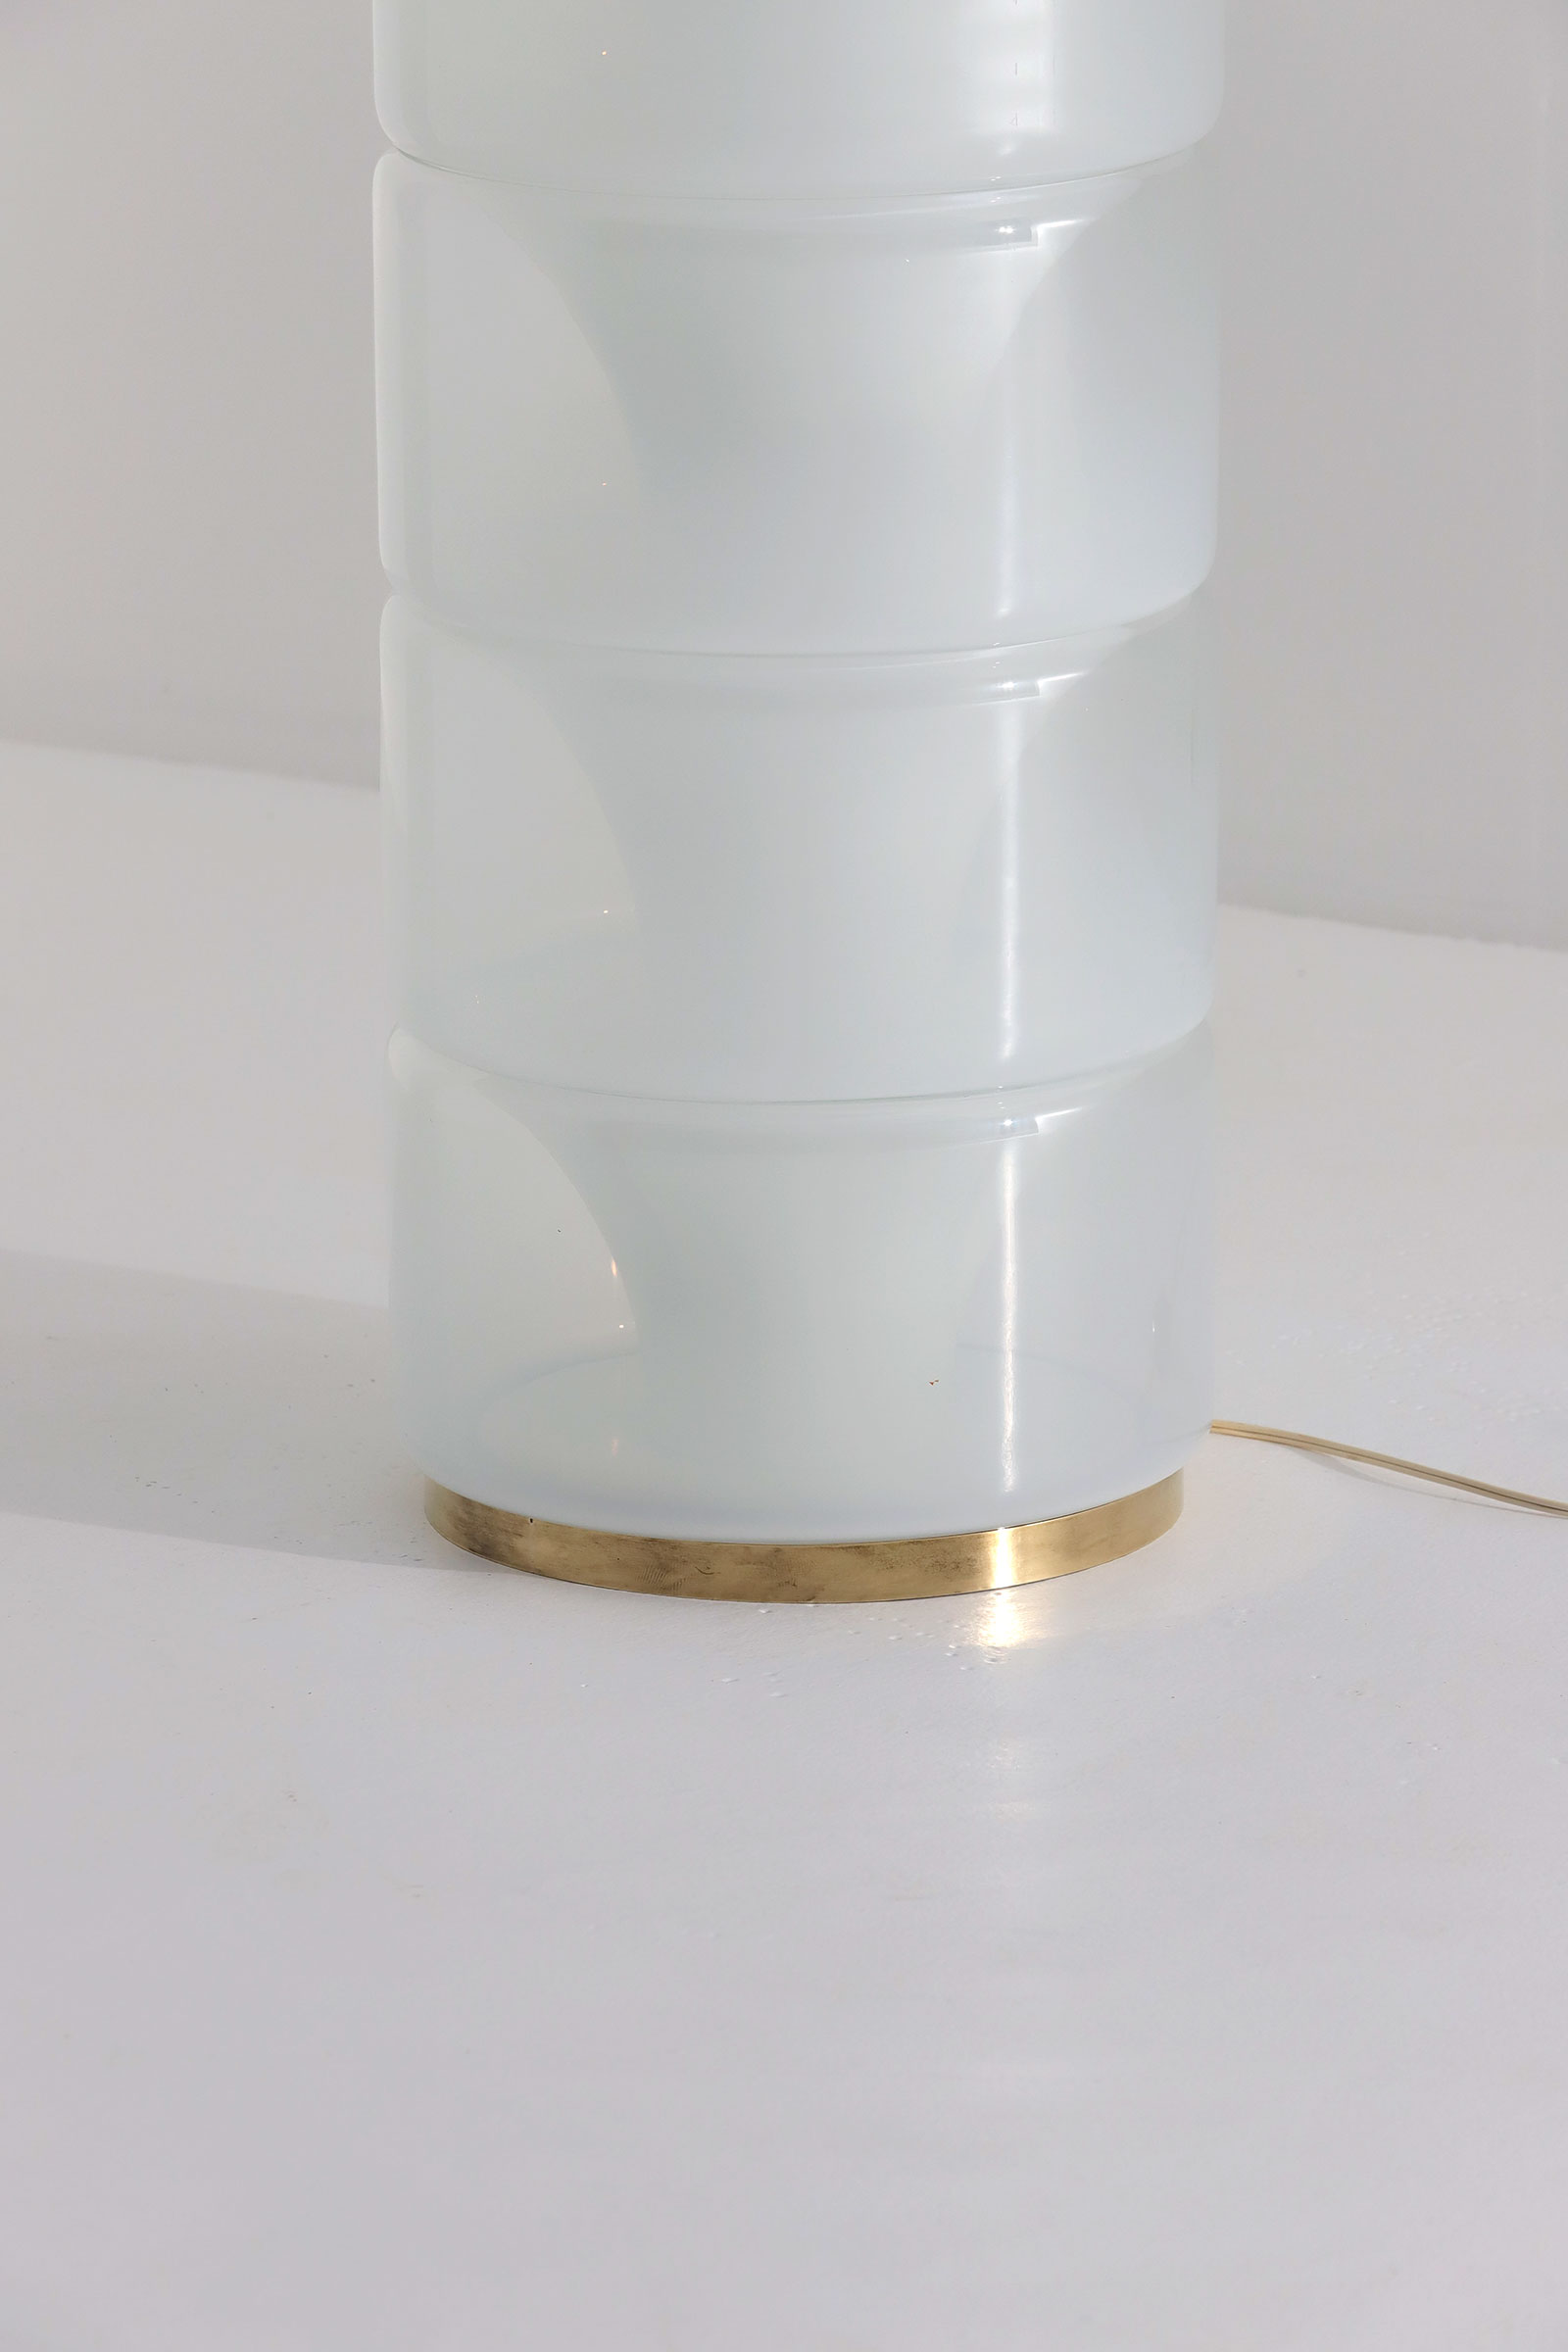 LT316 floor lamp by Carlo Nason for Mazzegaimage 2